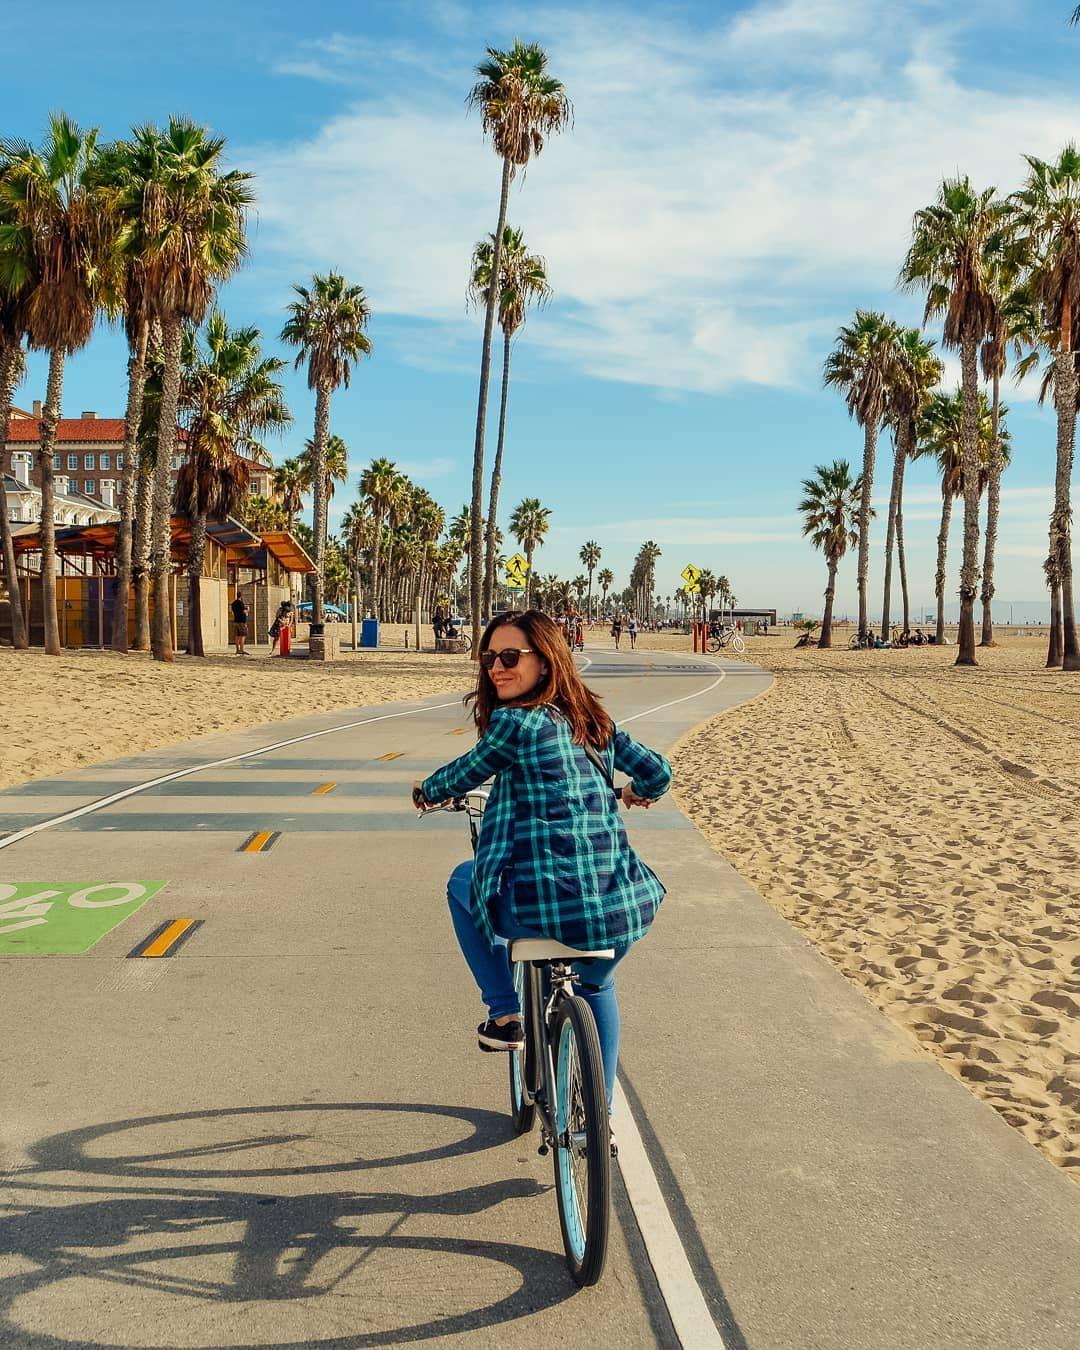 Rent Beach Cruiser Bikes And Ride From Santa Monica To Venice